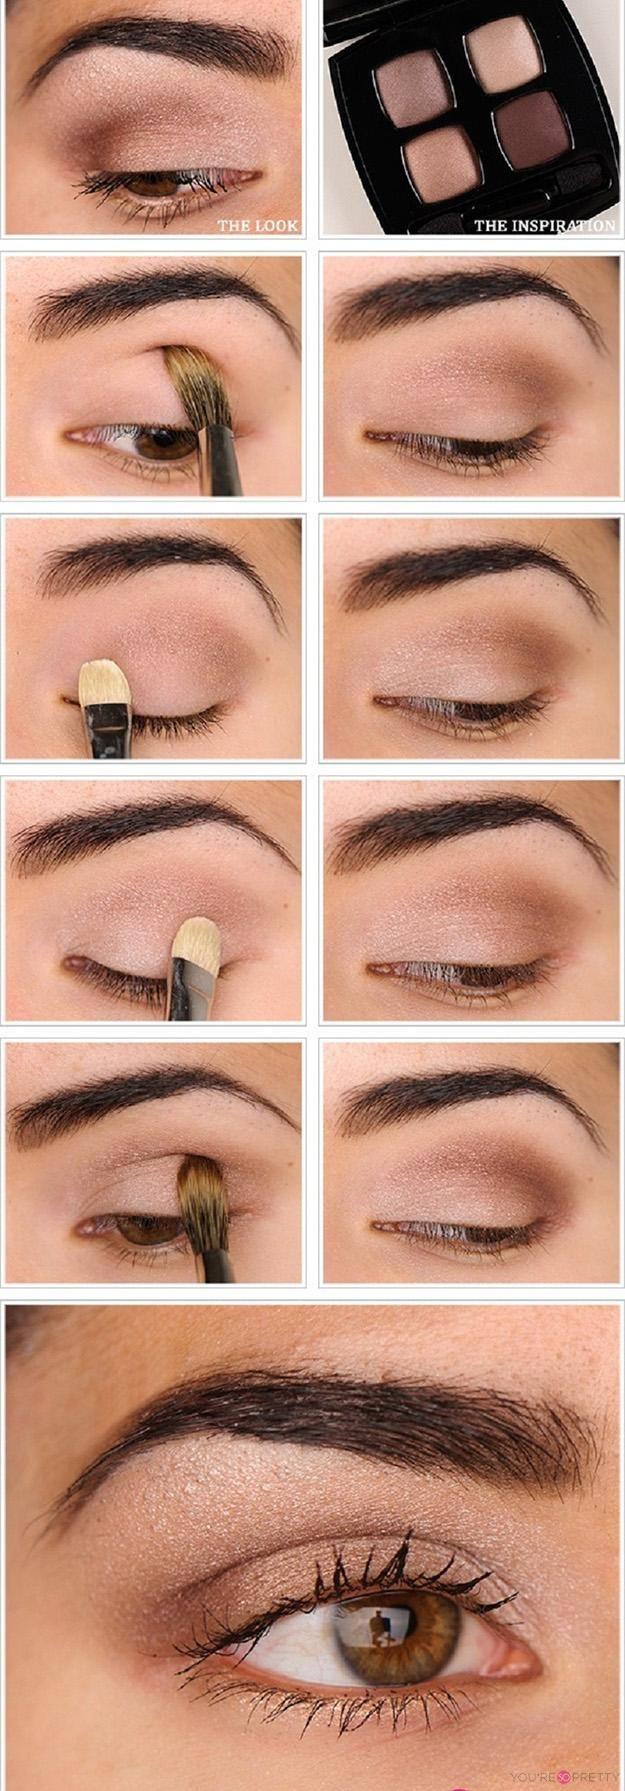 Everyday Natural Makeup Tutorials - You're So Pretty